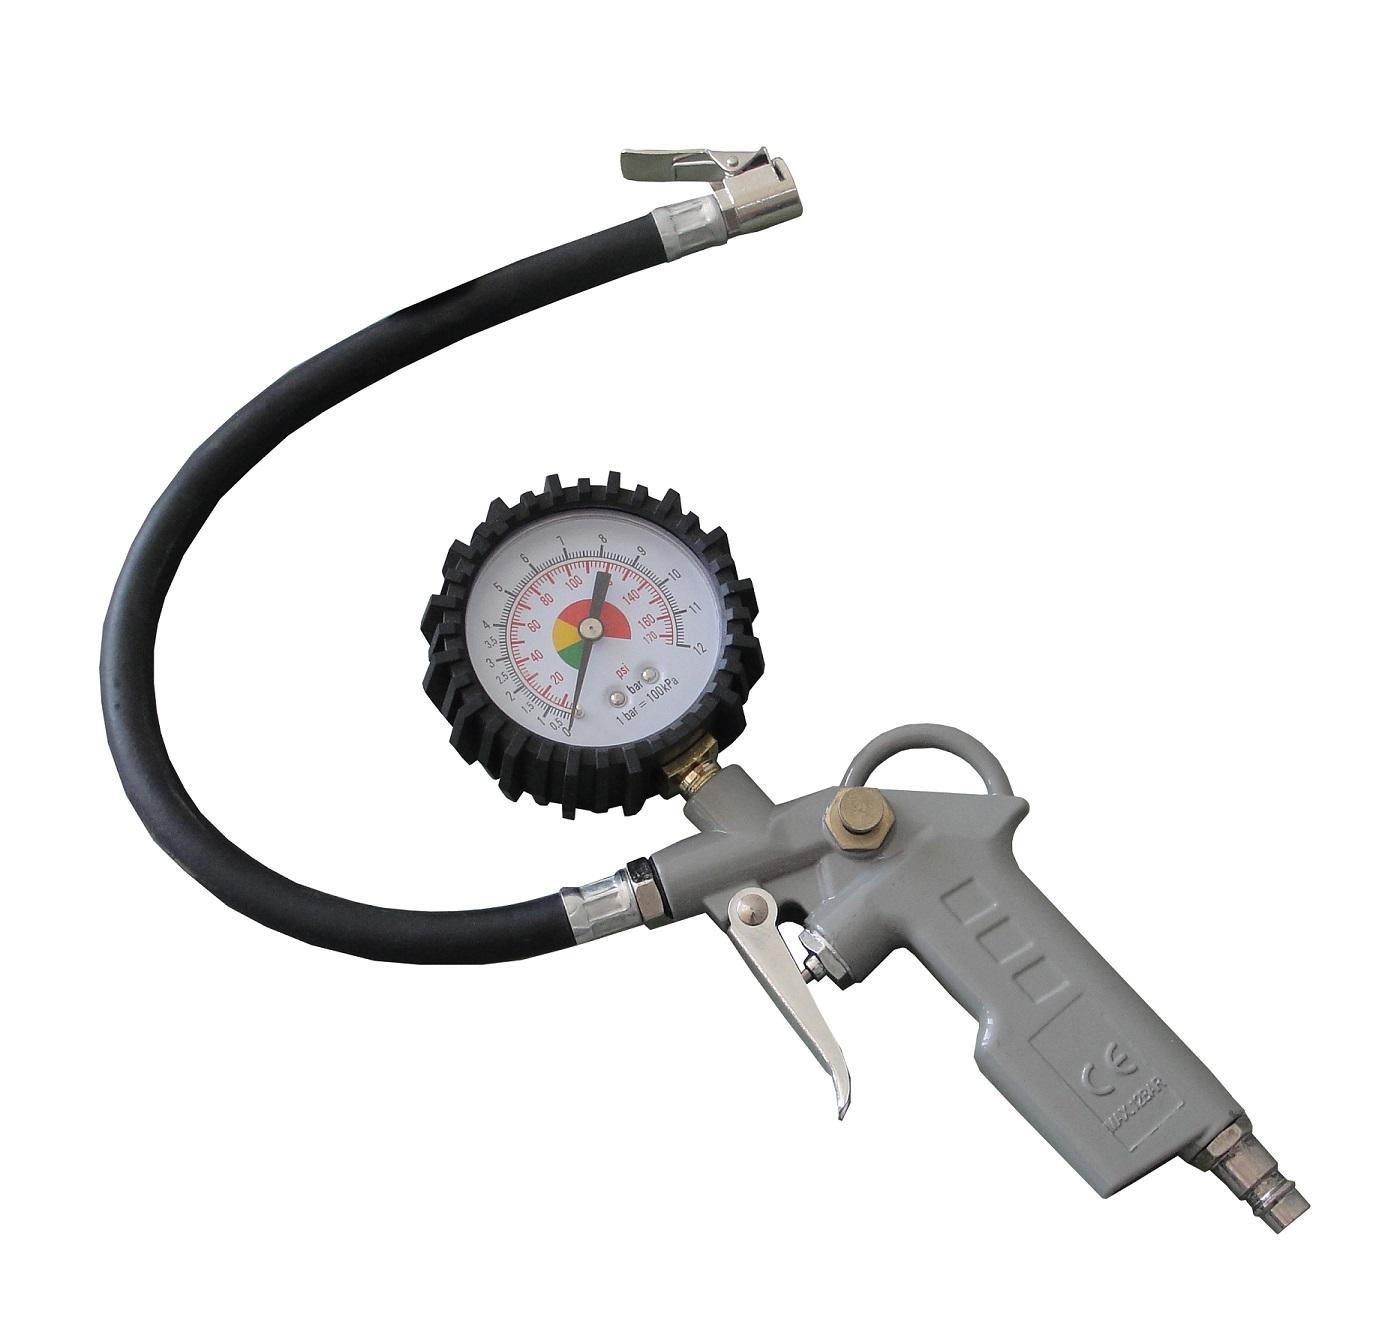 Plnič pneumatik s manometrem 0,8 MPa MarPol